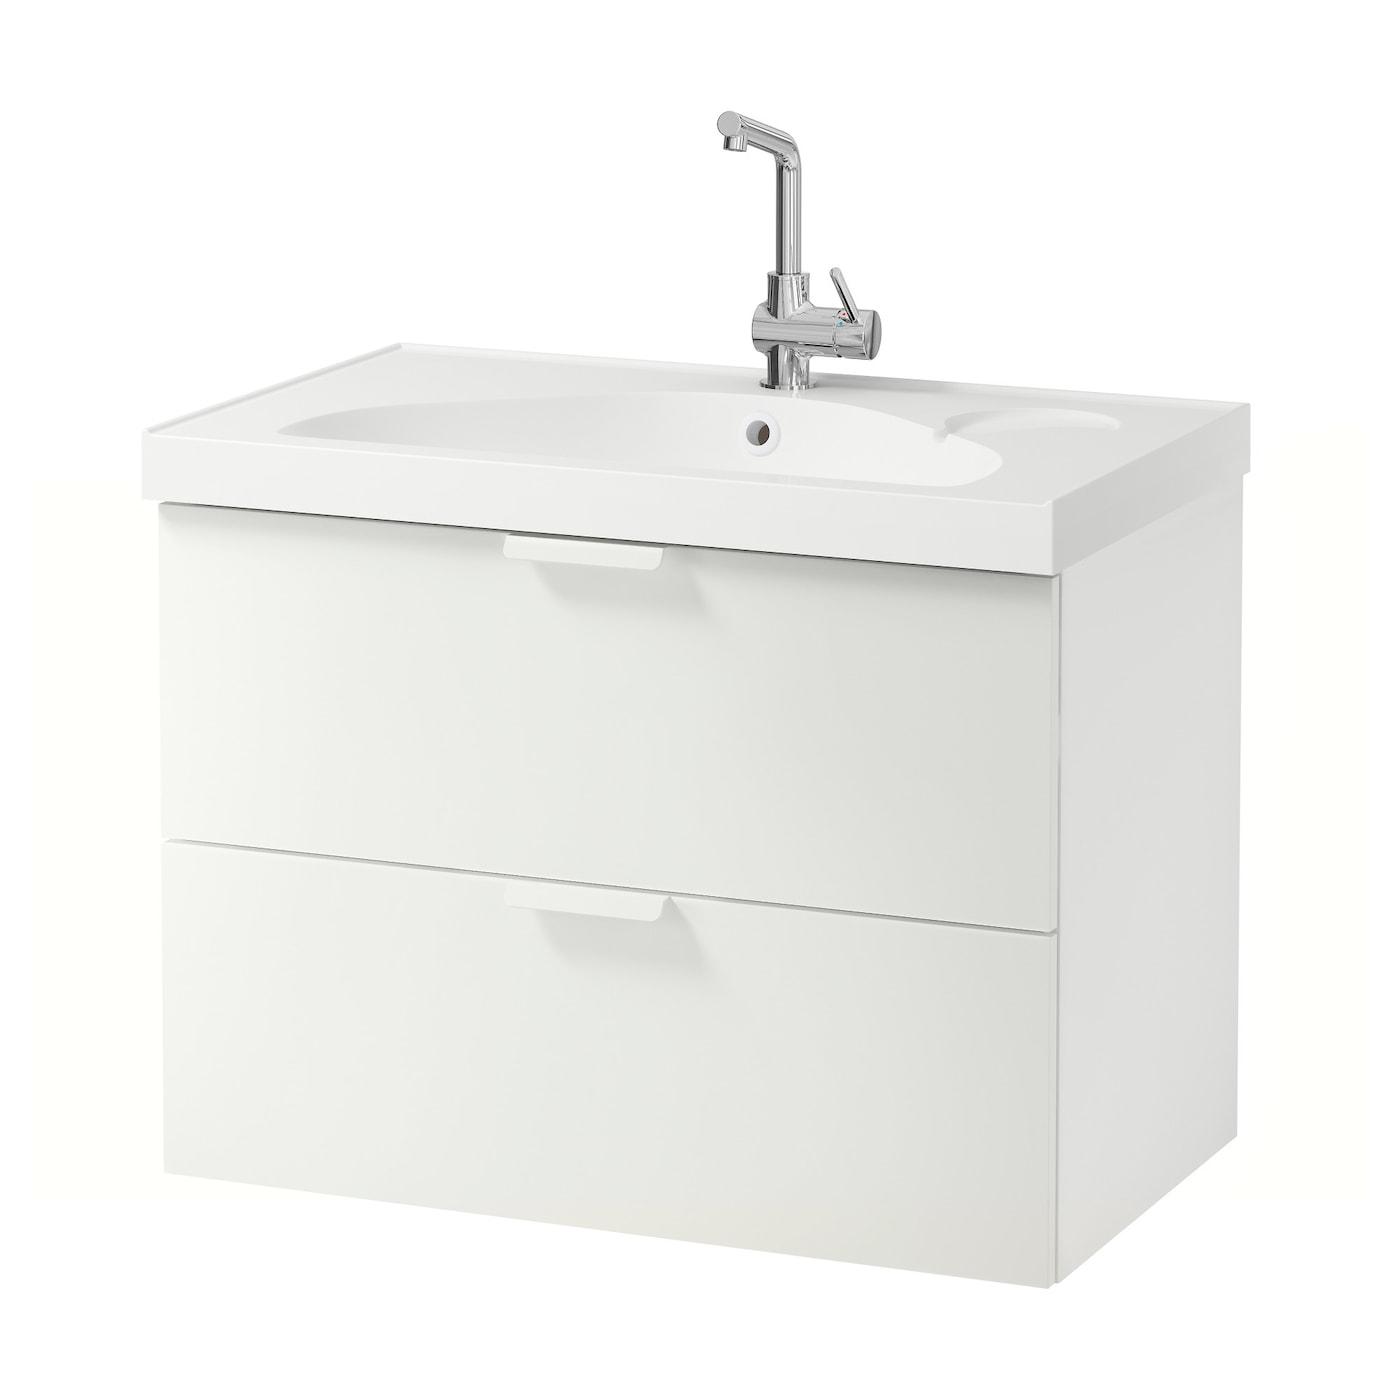 godmorgon edeboviken wash stand with 2 drawers white. Black Bedroom Furniture Sets. Home Design Ideas